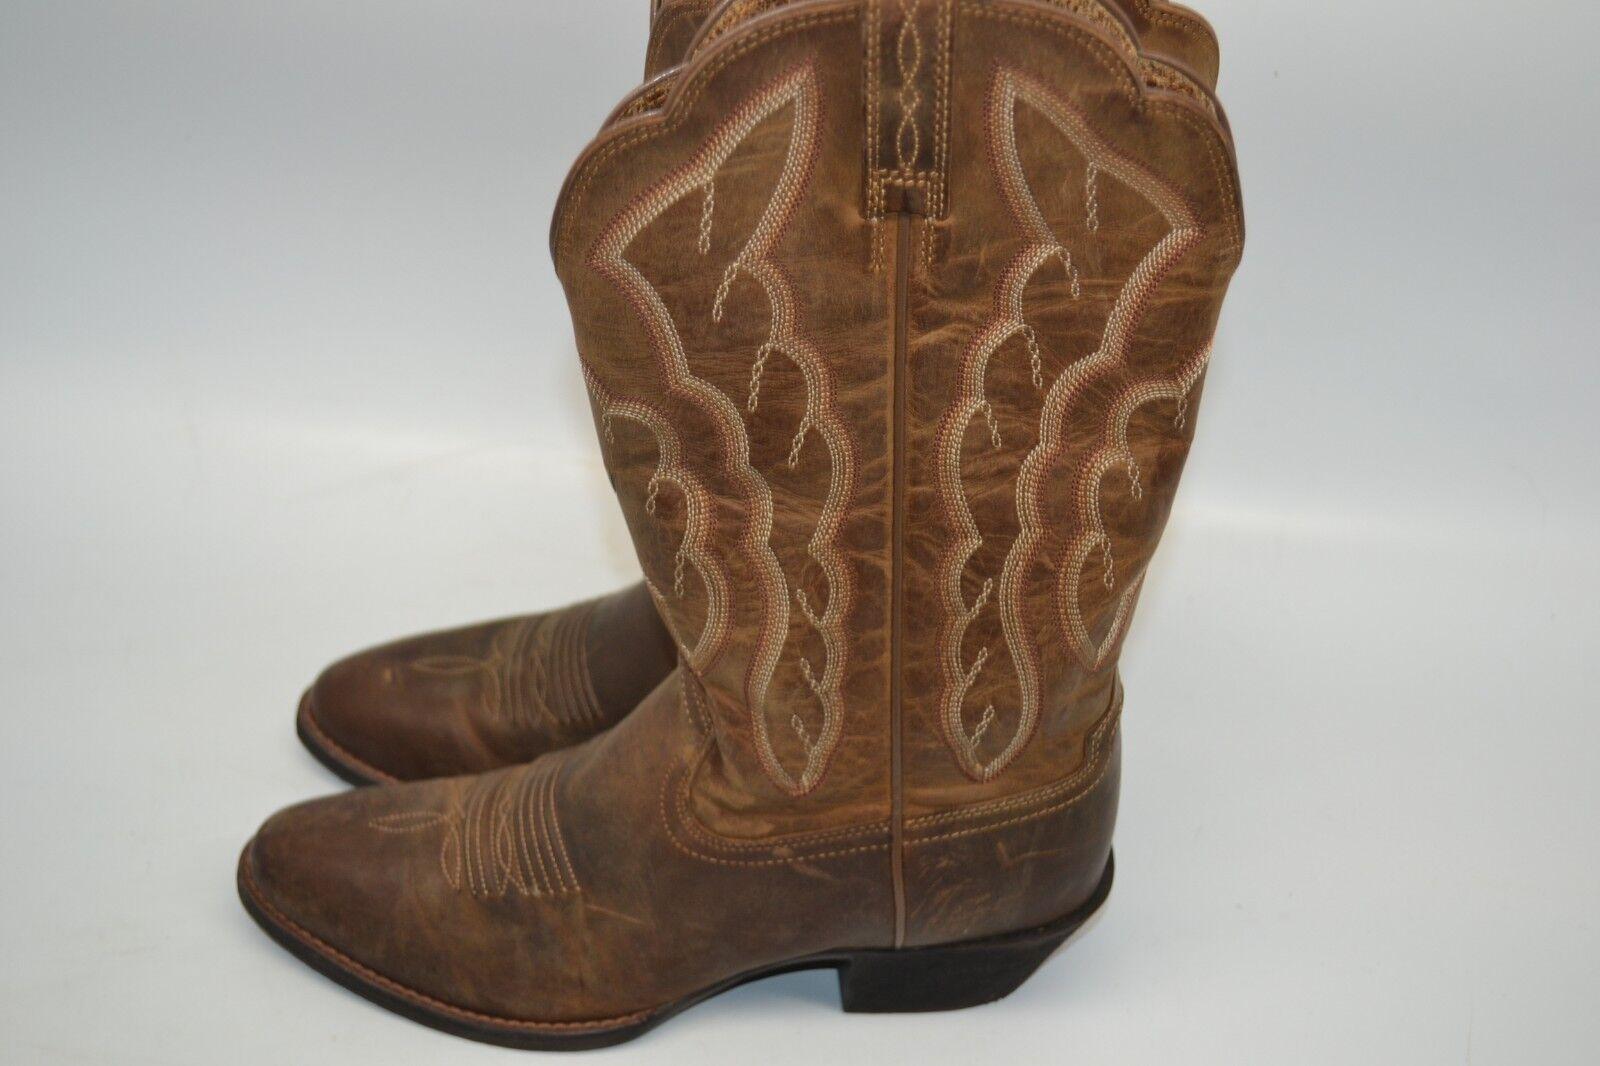 Ariat damen 6.5 B Heritage R Toe Toe Toe Cowboy Western Stiefel Distressed braun 10020289 008a5b